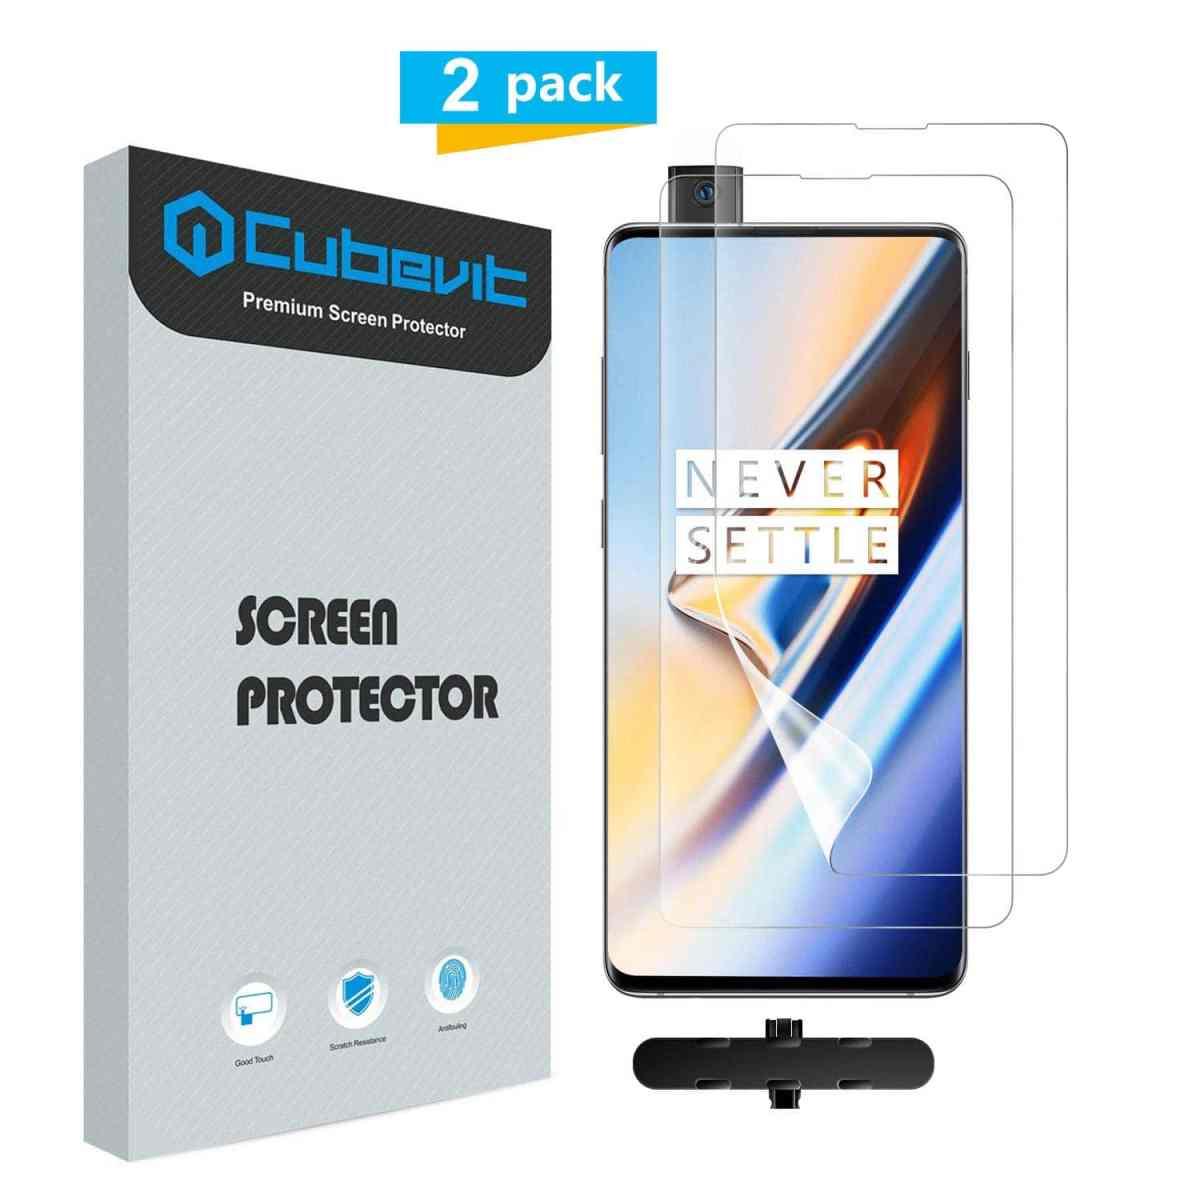 Cubevit Best OnePlus 7 Pro Screen Protectors